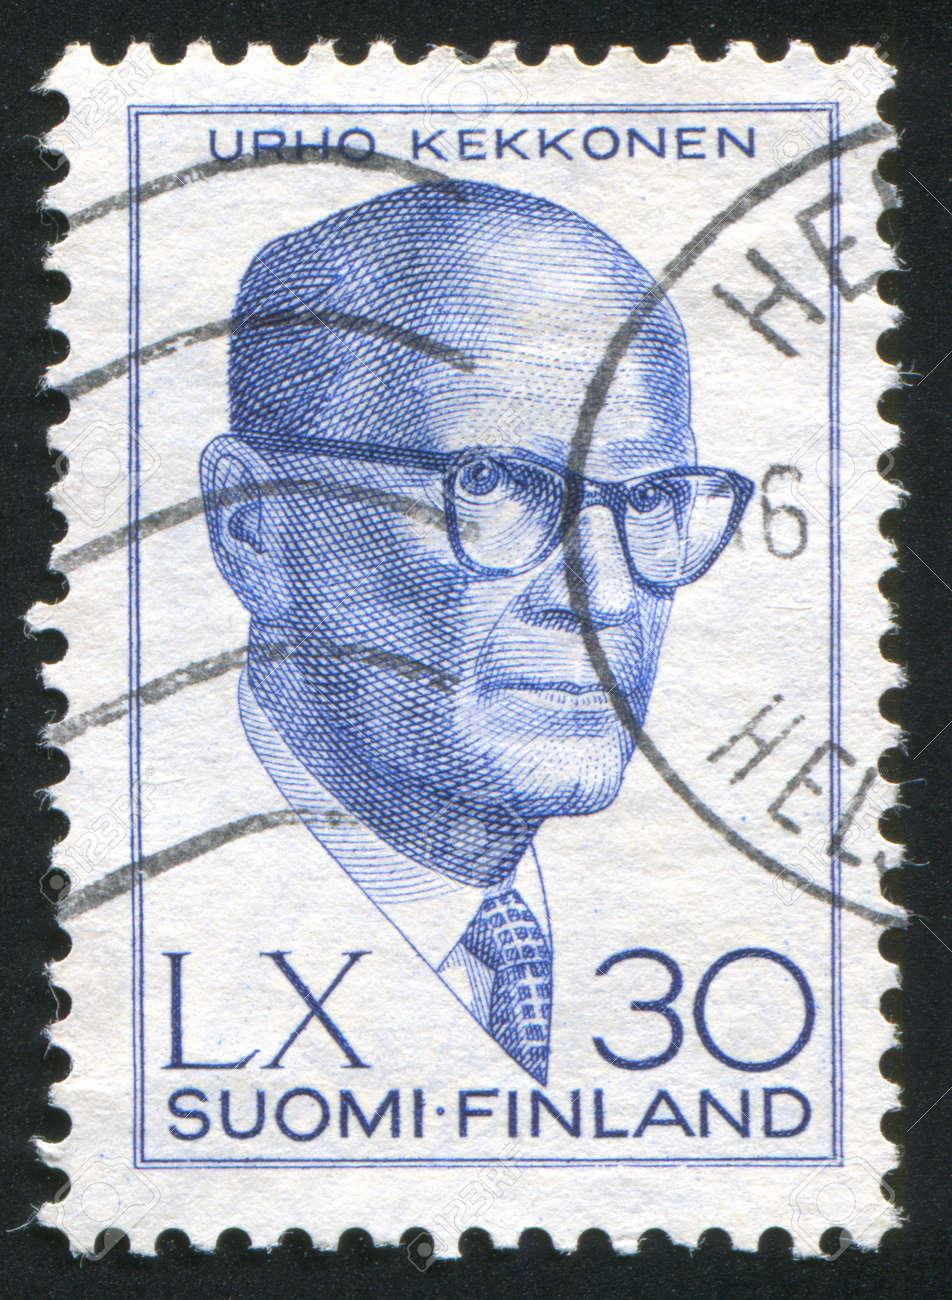 FINLAND - CIRCA 1960: stamp printed by Finland, shows President Urho Kekkonen, circa 1960 Stock Photo - 14224310